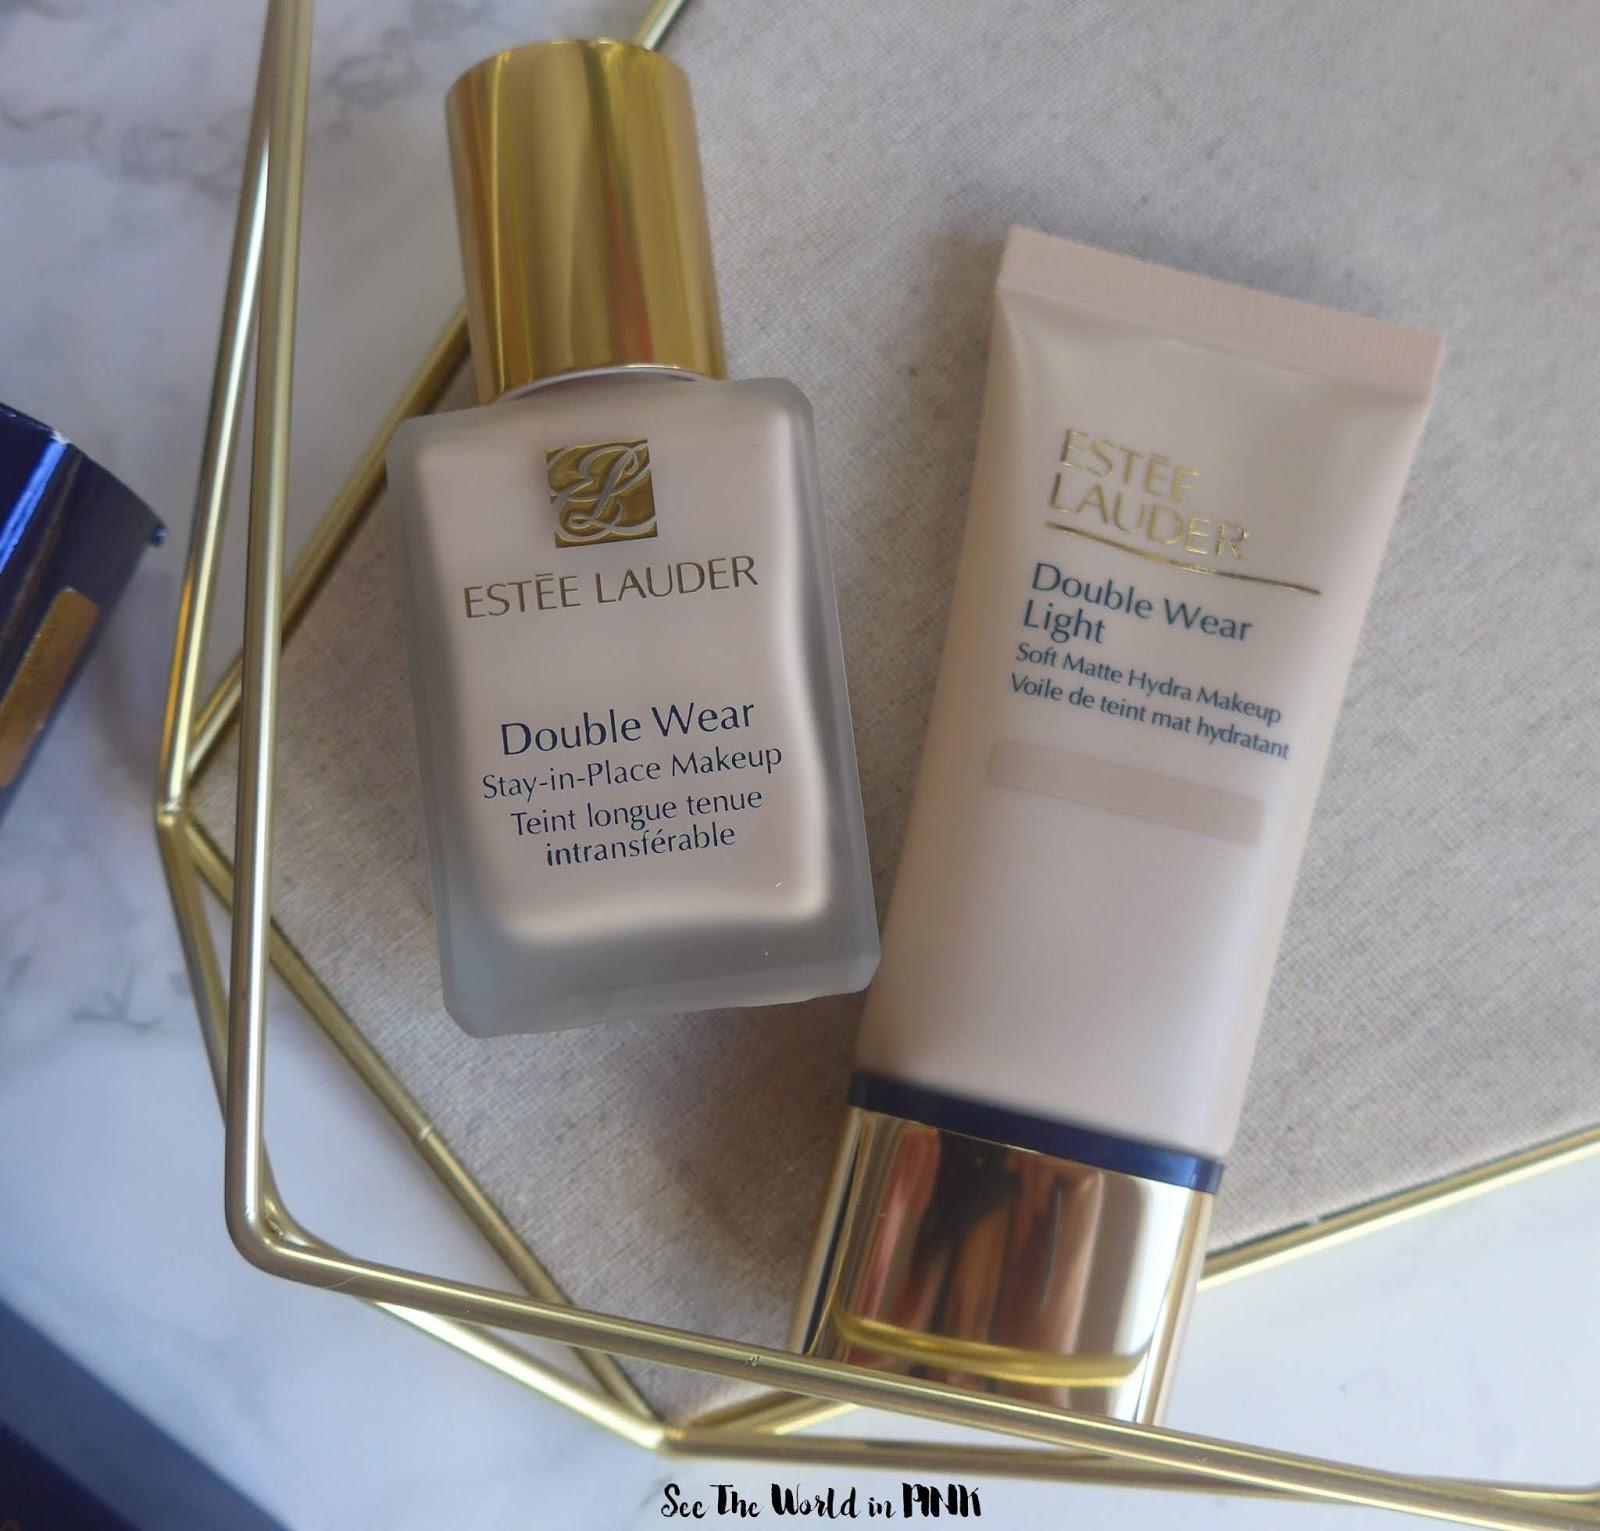 Foundation Showdown - Estee Lauder Double Wear Stay-in-Place Makeup vs. Double Wear Light Soft Matte Hydra Makeup